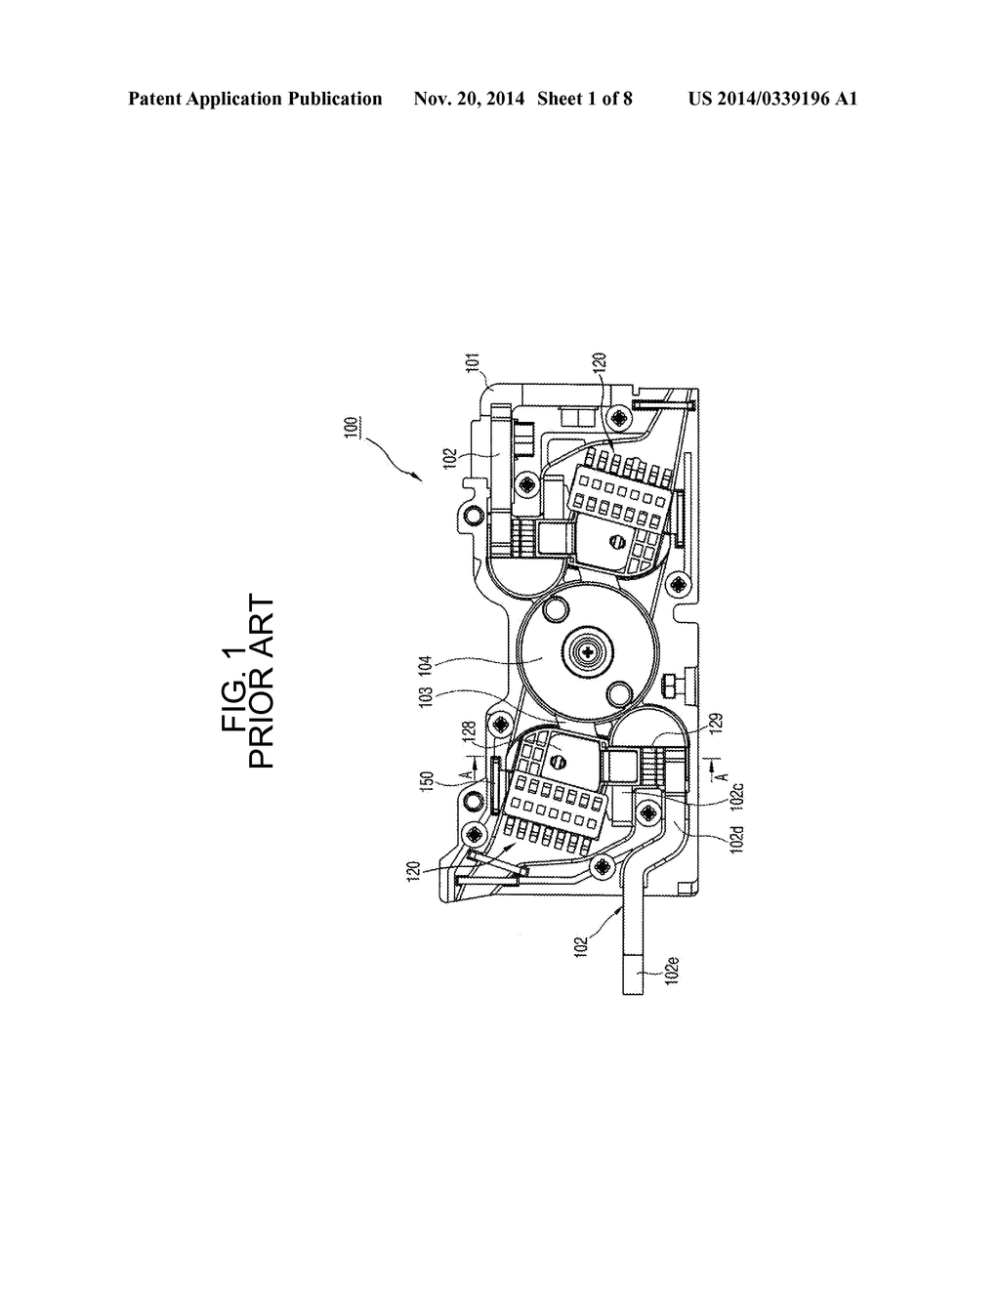 medium resolution of arc extinguishing unit for molded case circuit breaker diagram schematic and image 02